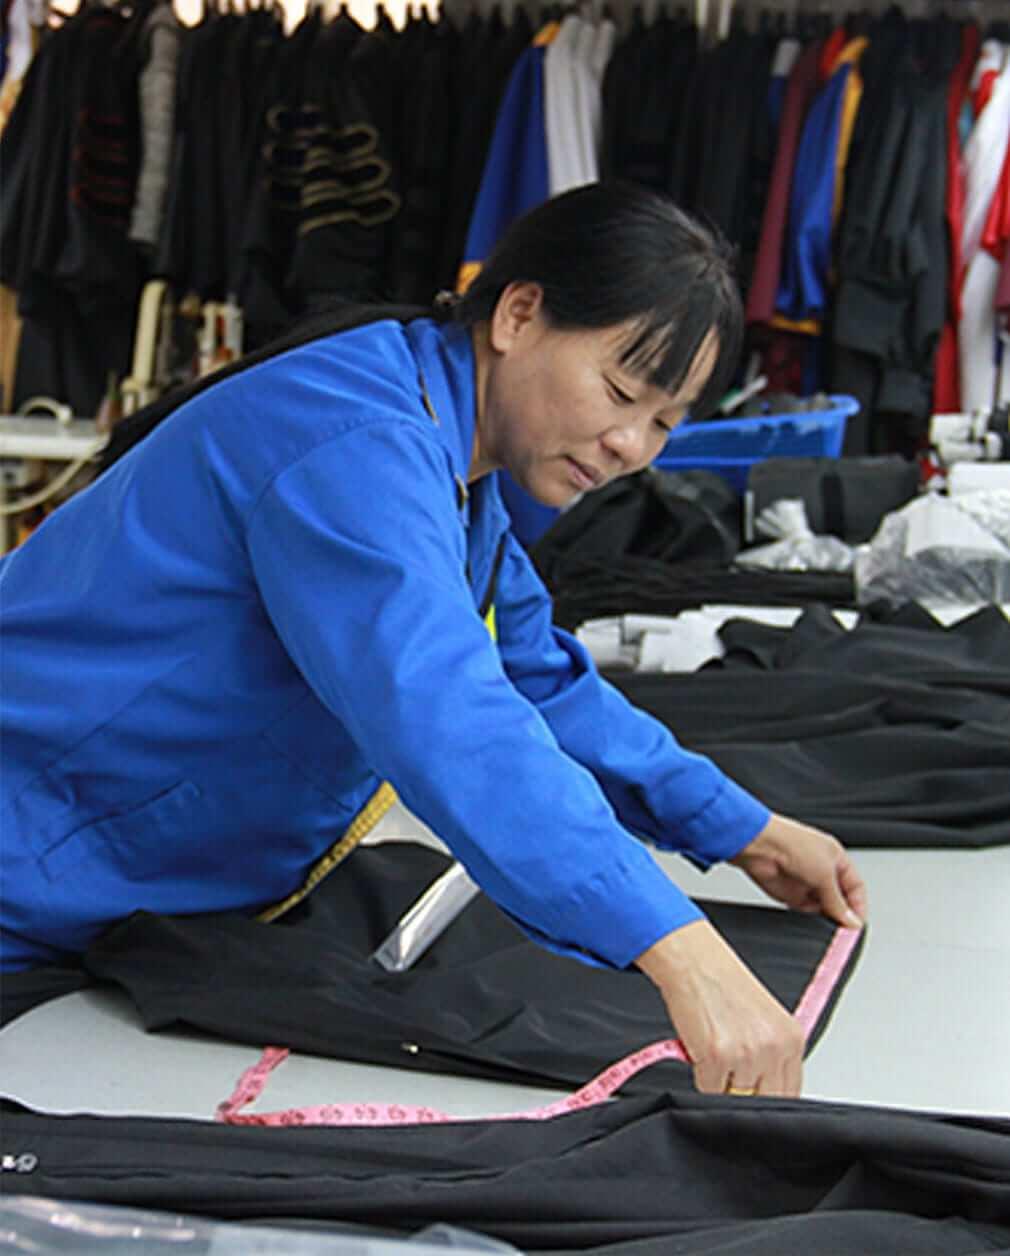 0614_YullexChina_1010x1256_facilities-min